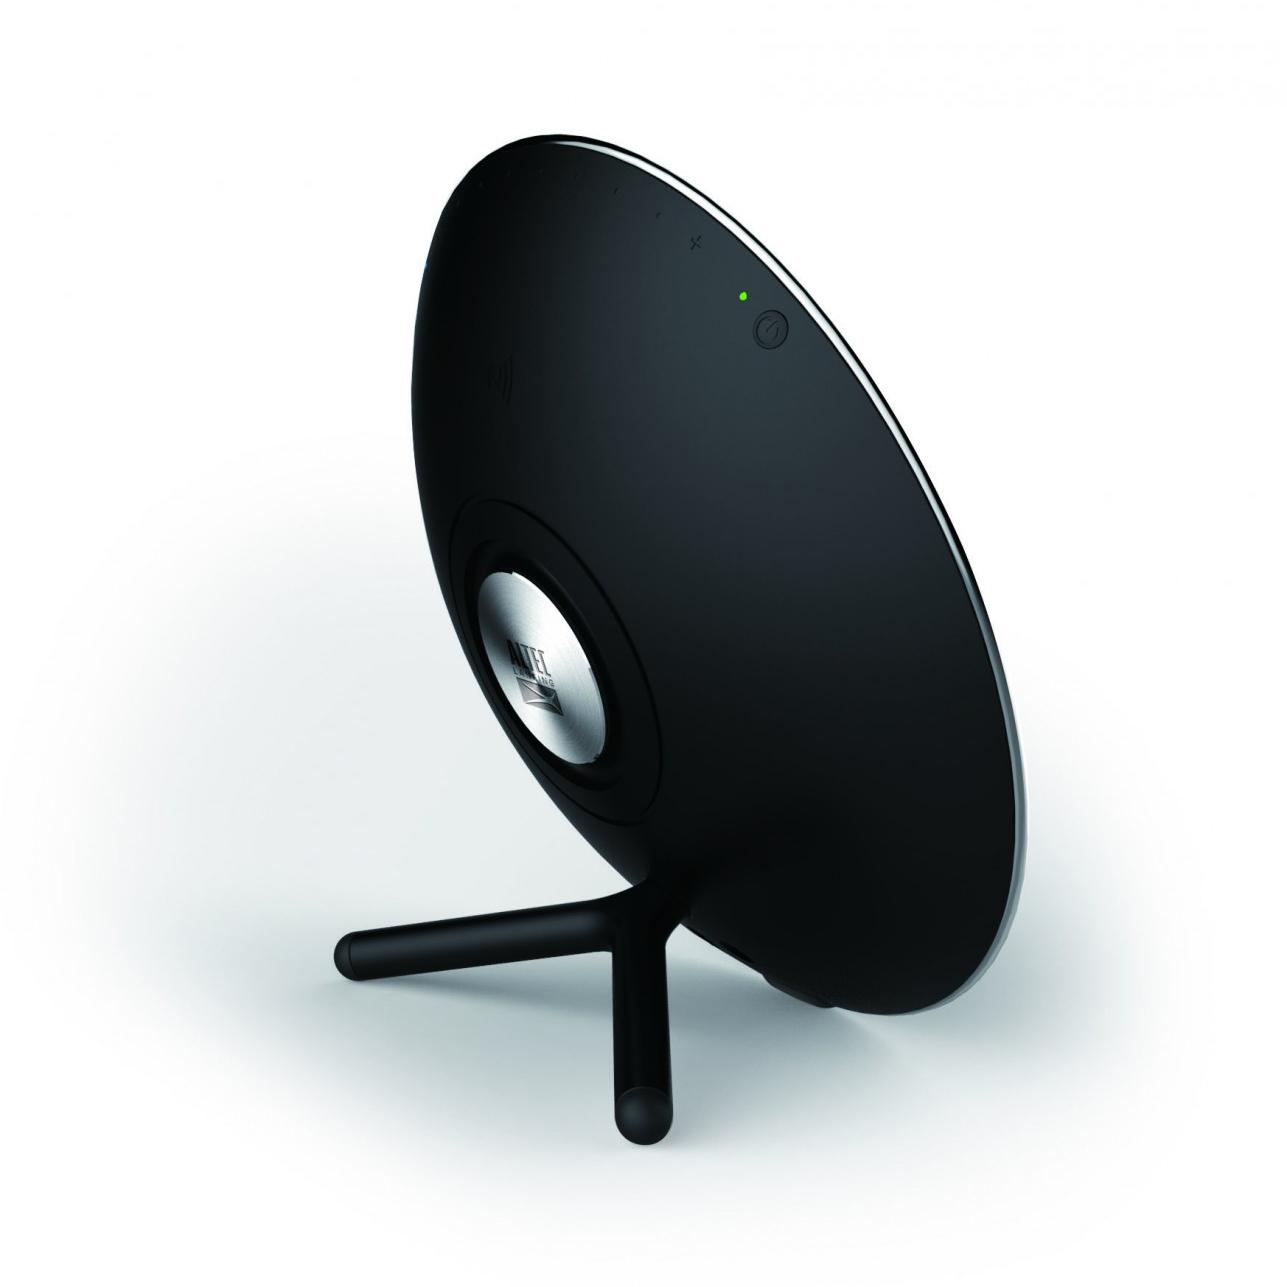 Loa Altec Lansing Cymbale hiệu năng cao